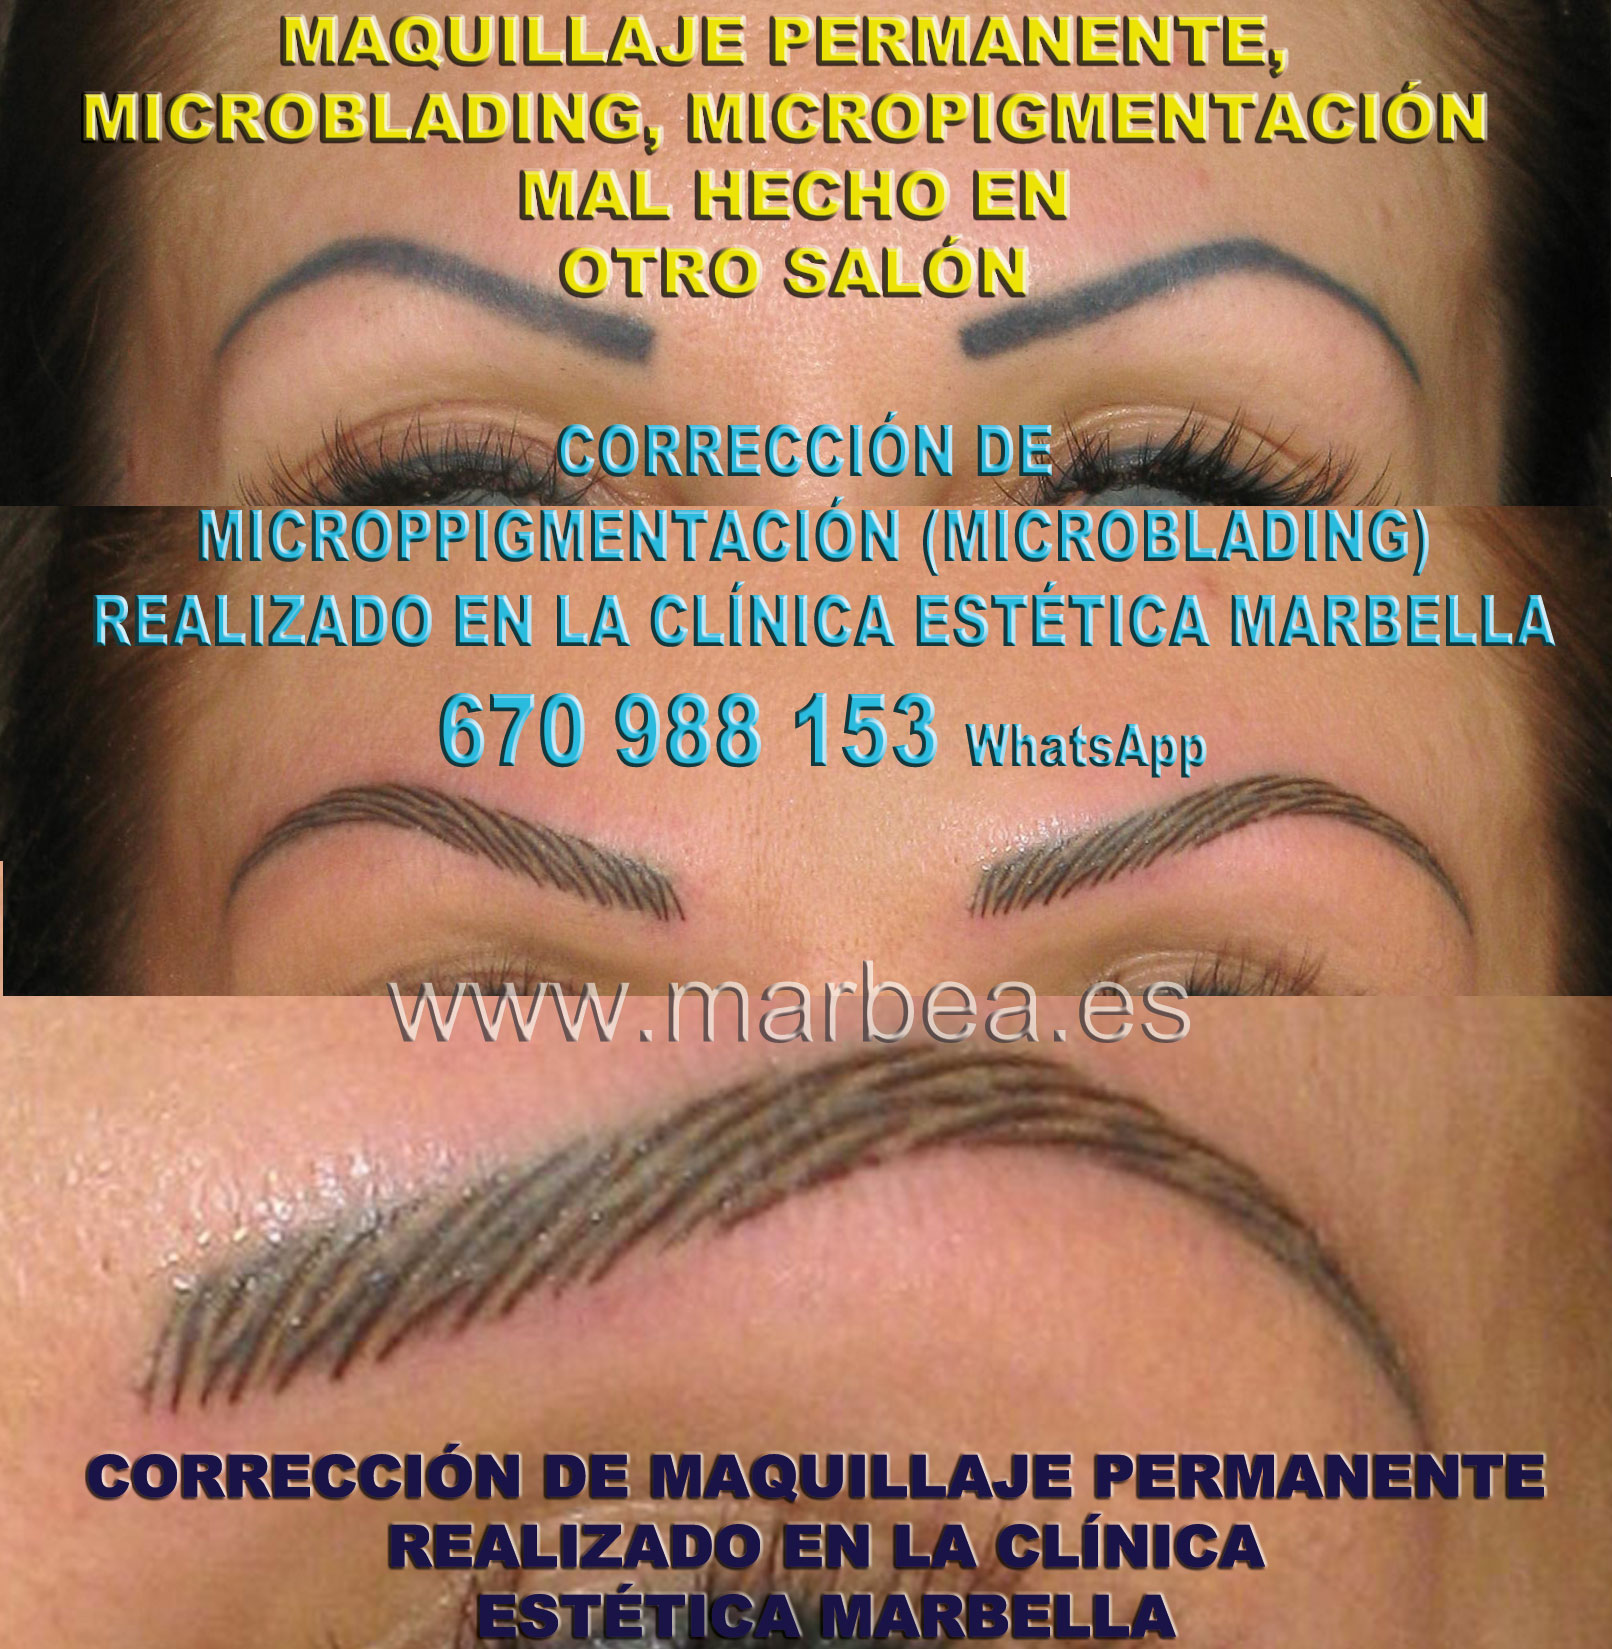 MAQUILLAJE PERMANENTE CEJAS MAL HECHO clínica estética micropigmentación entrega corrección de cejas mal tatuadas,micropigmentación correctiva cejas mal hecha